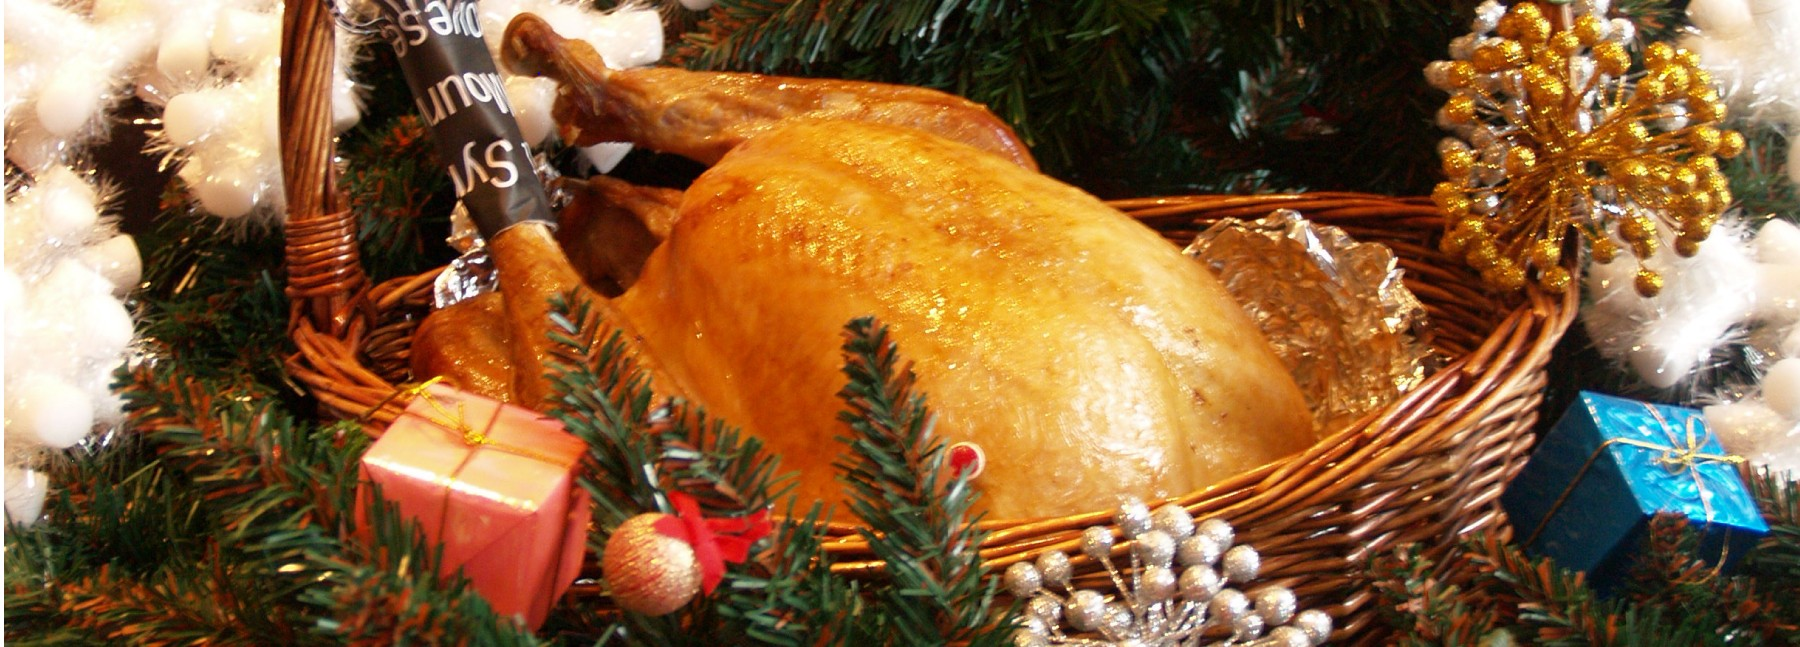 Christmas restaurant promotion